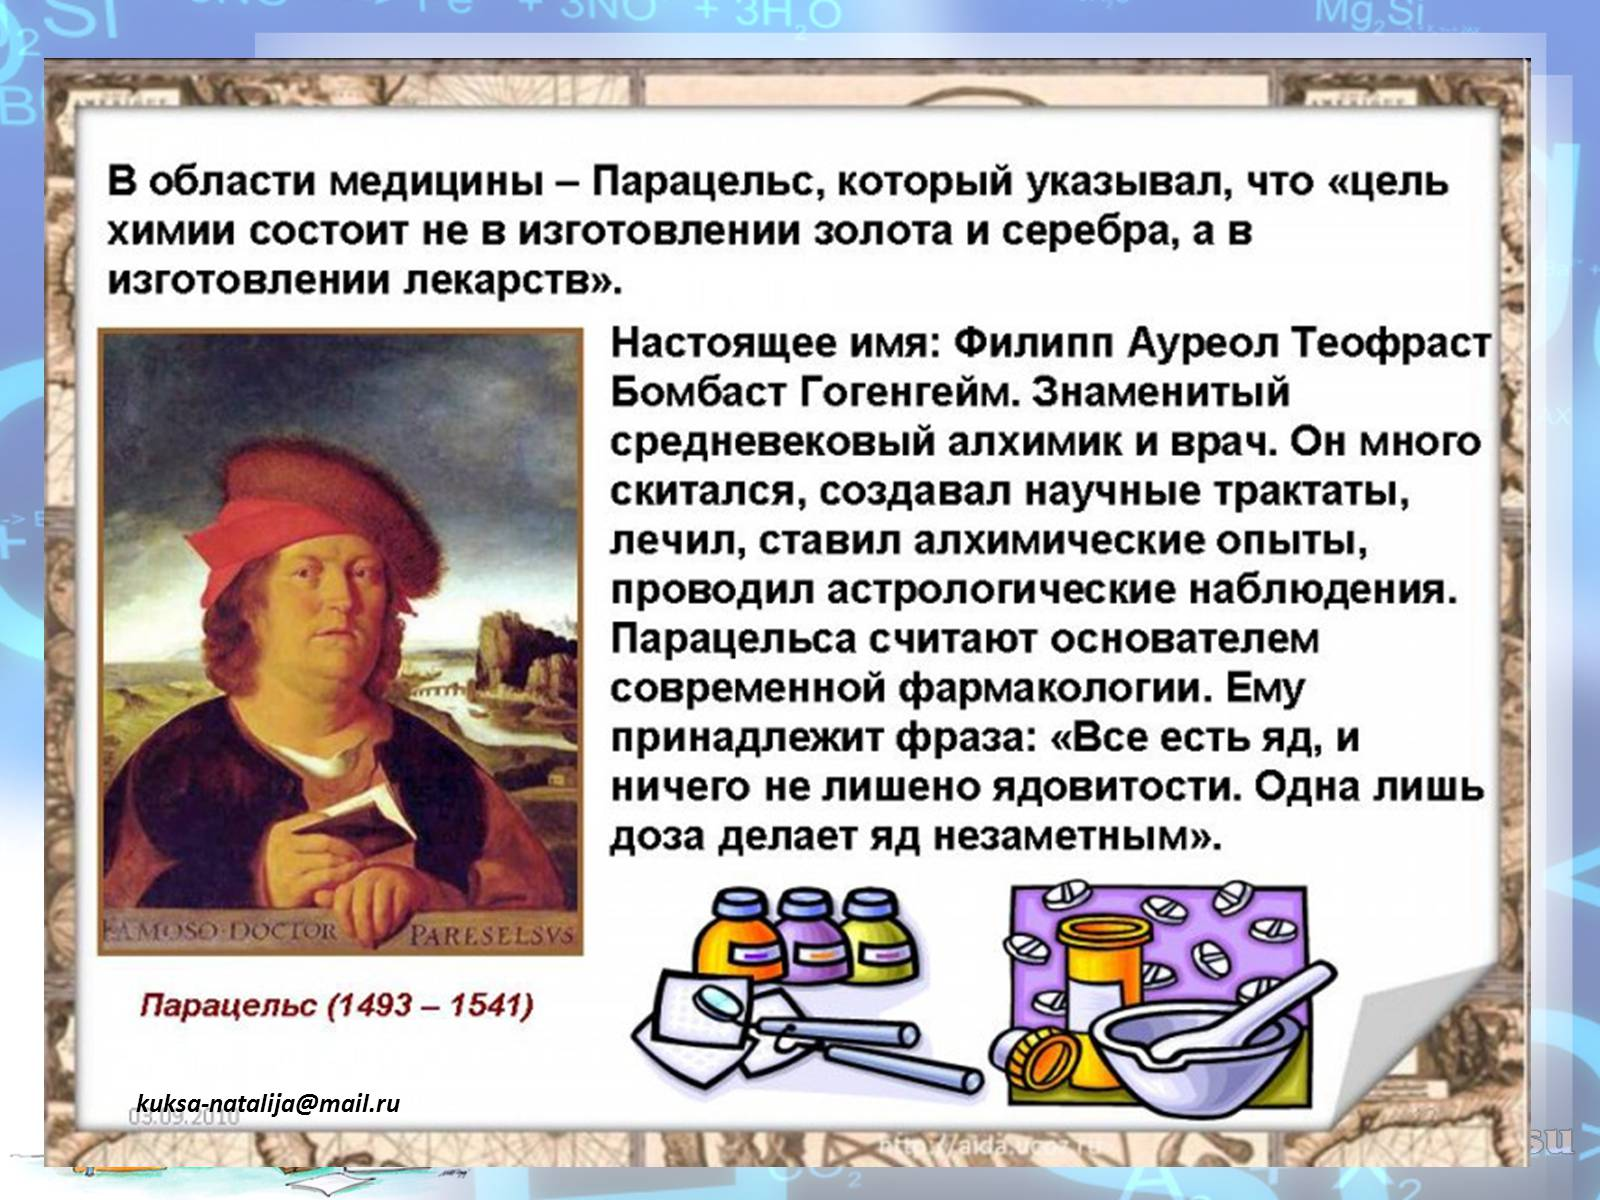 Статус истории как науки